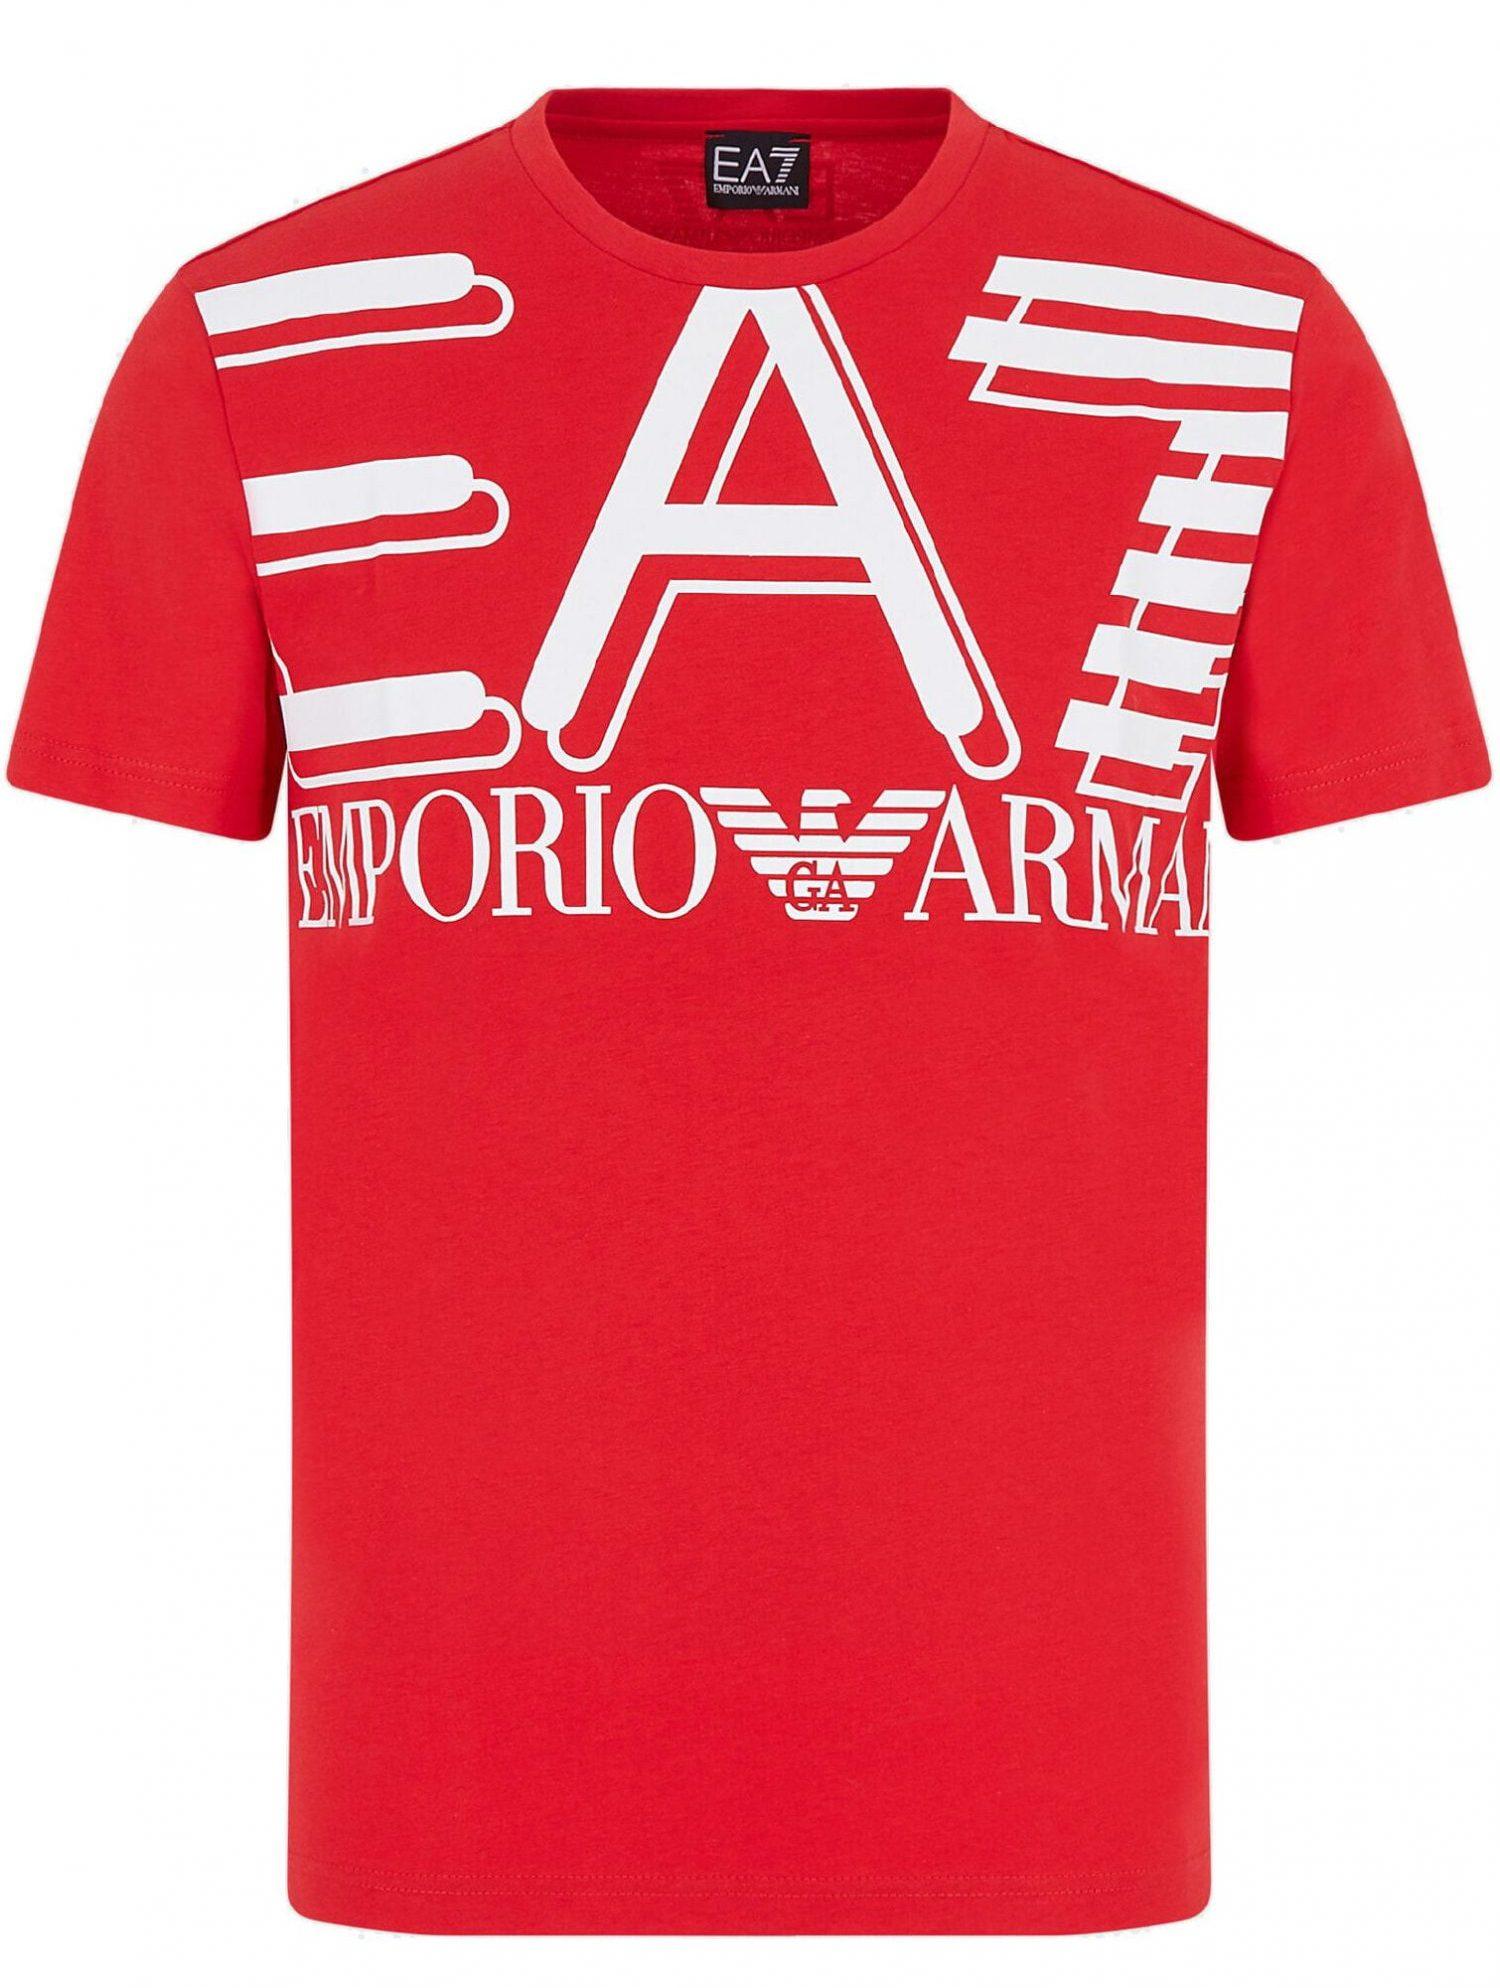 T-shirt EA7 duże białe logo